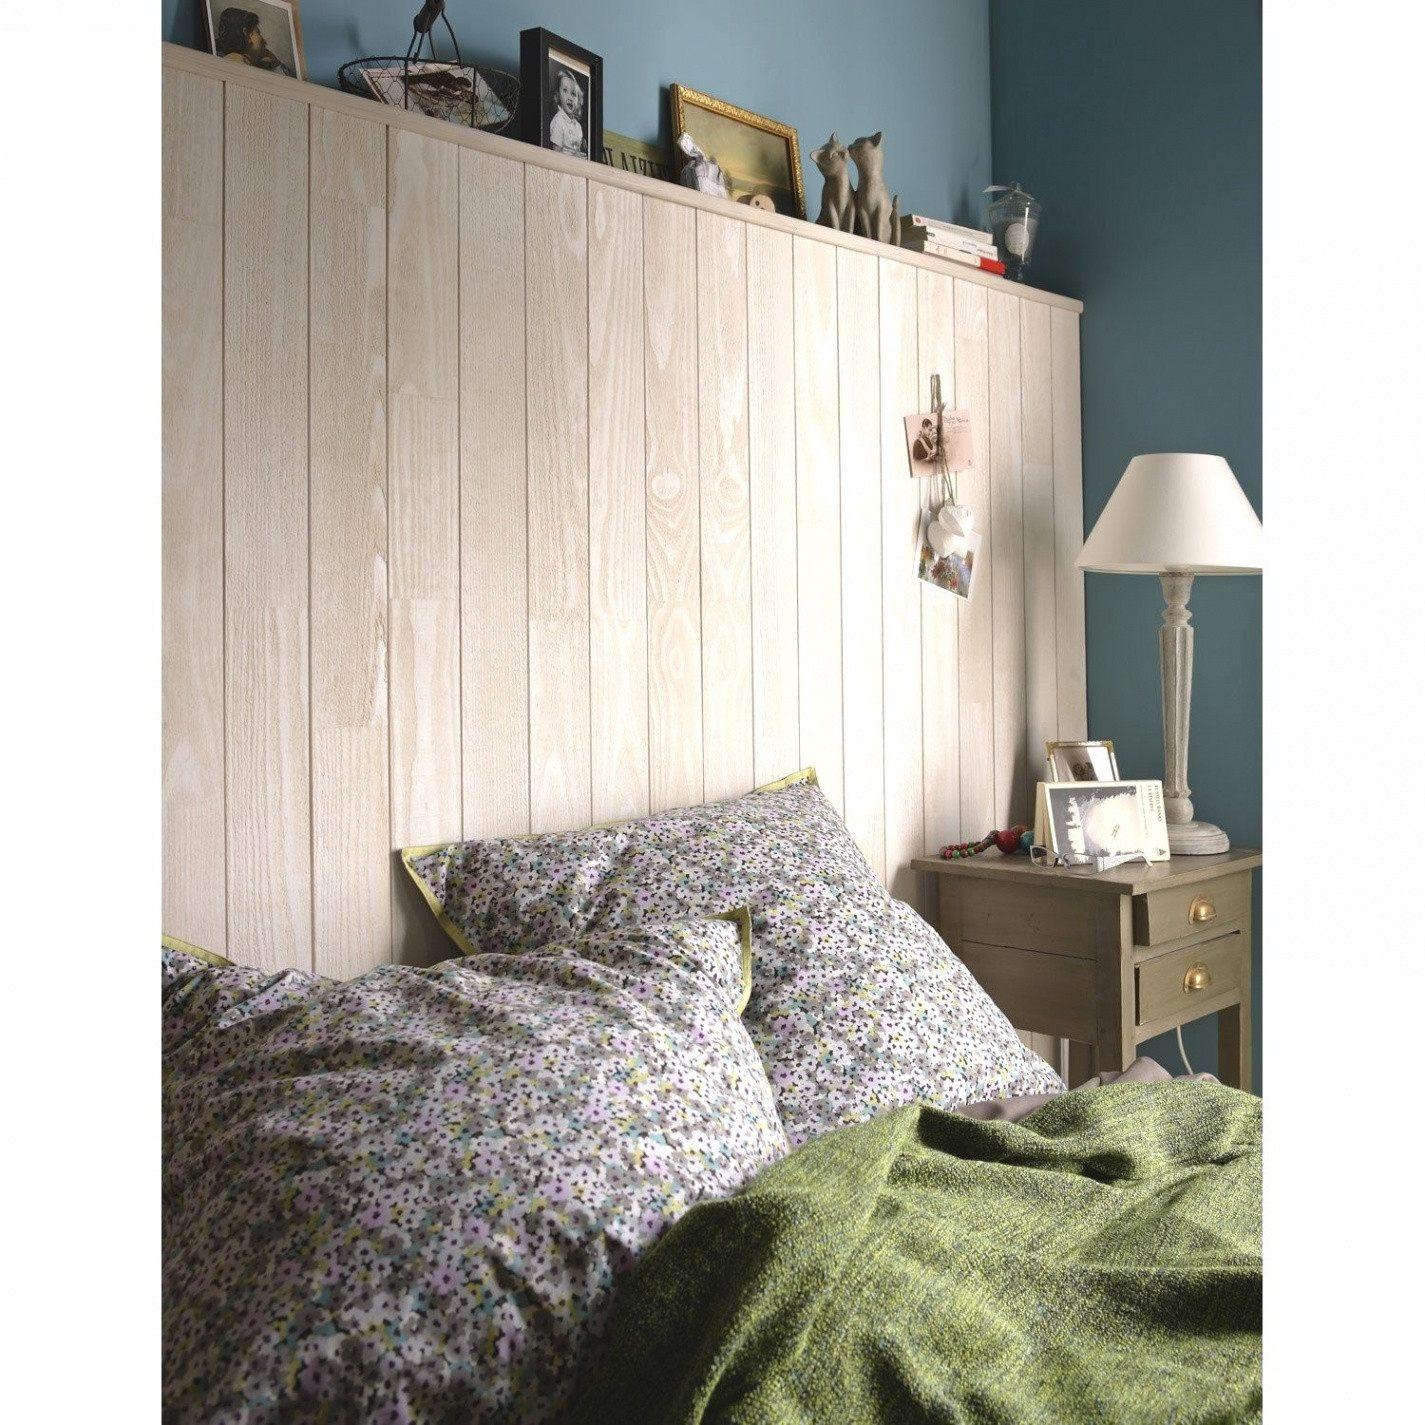 Tete De Lit 200 Cm Inspirant Tete De Lit 200 Tissu Tete De Lit Ikea 180 Fauteuil Salon Ikea Fresh